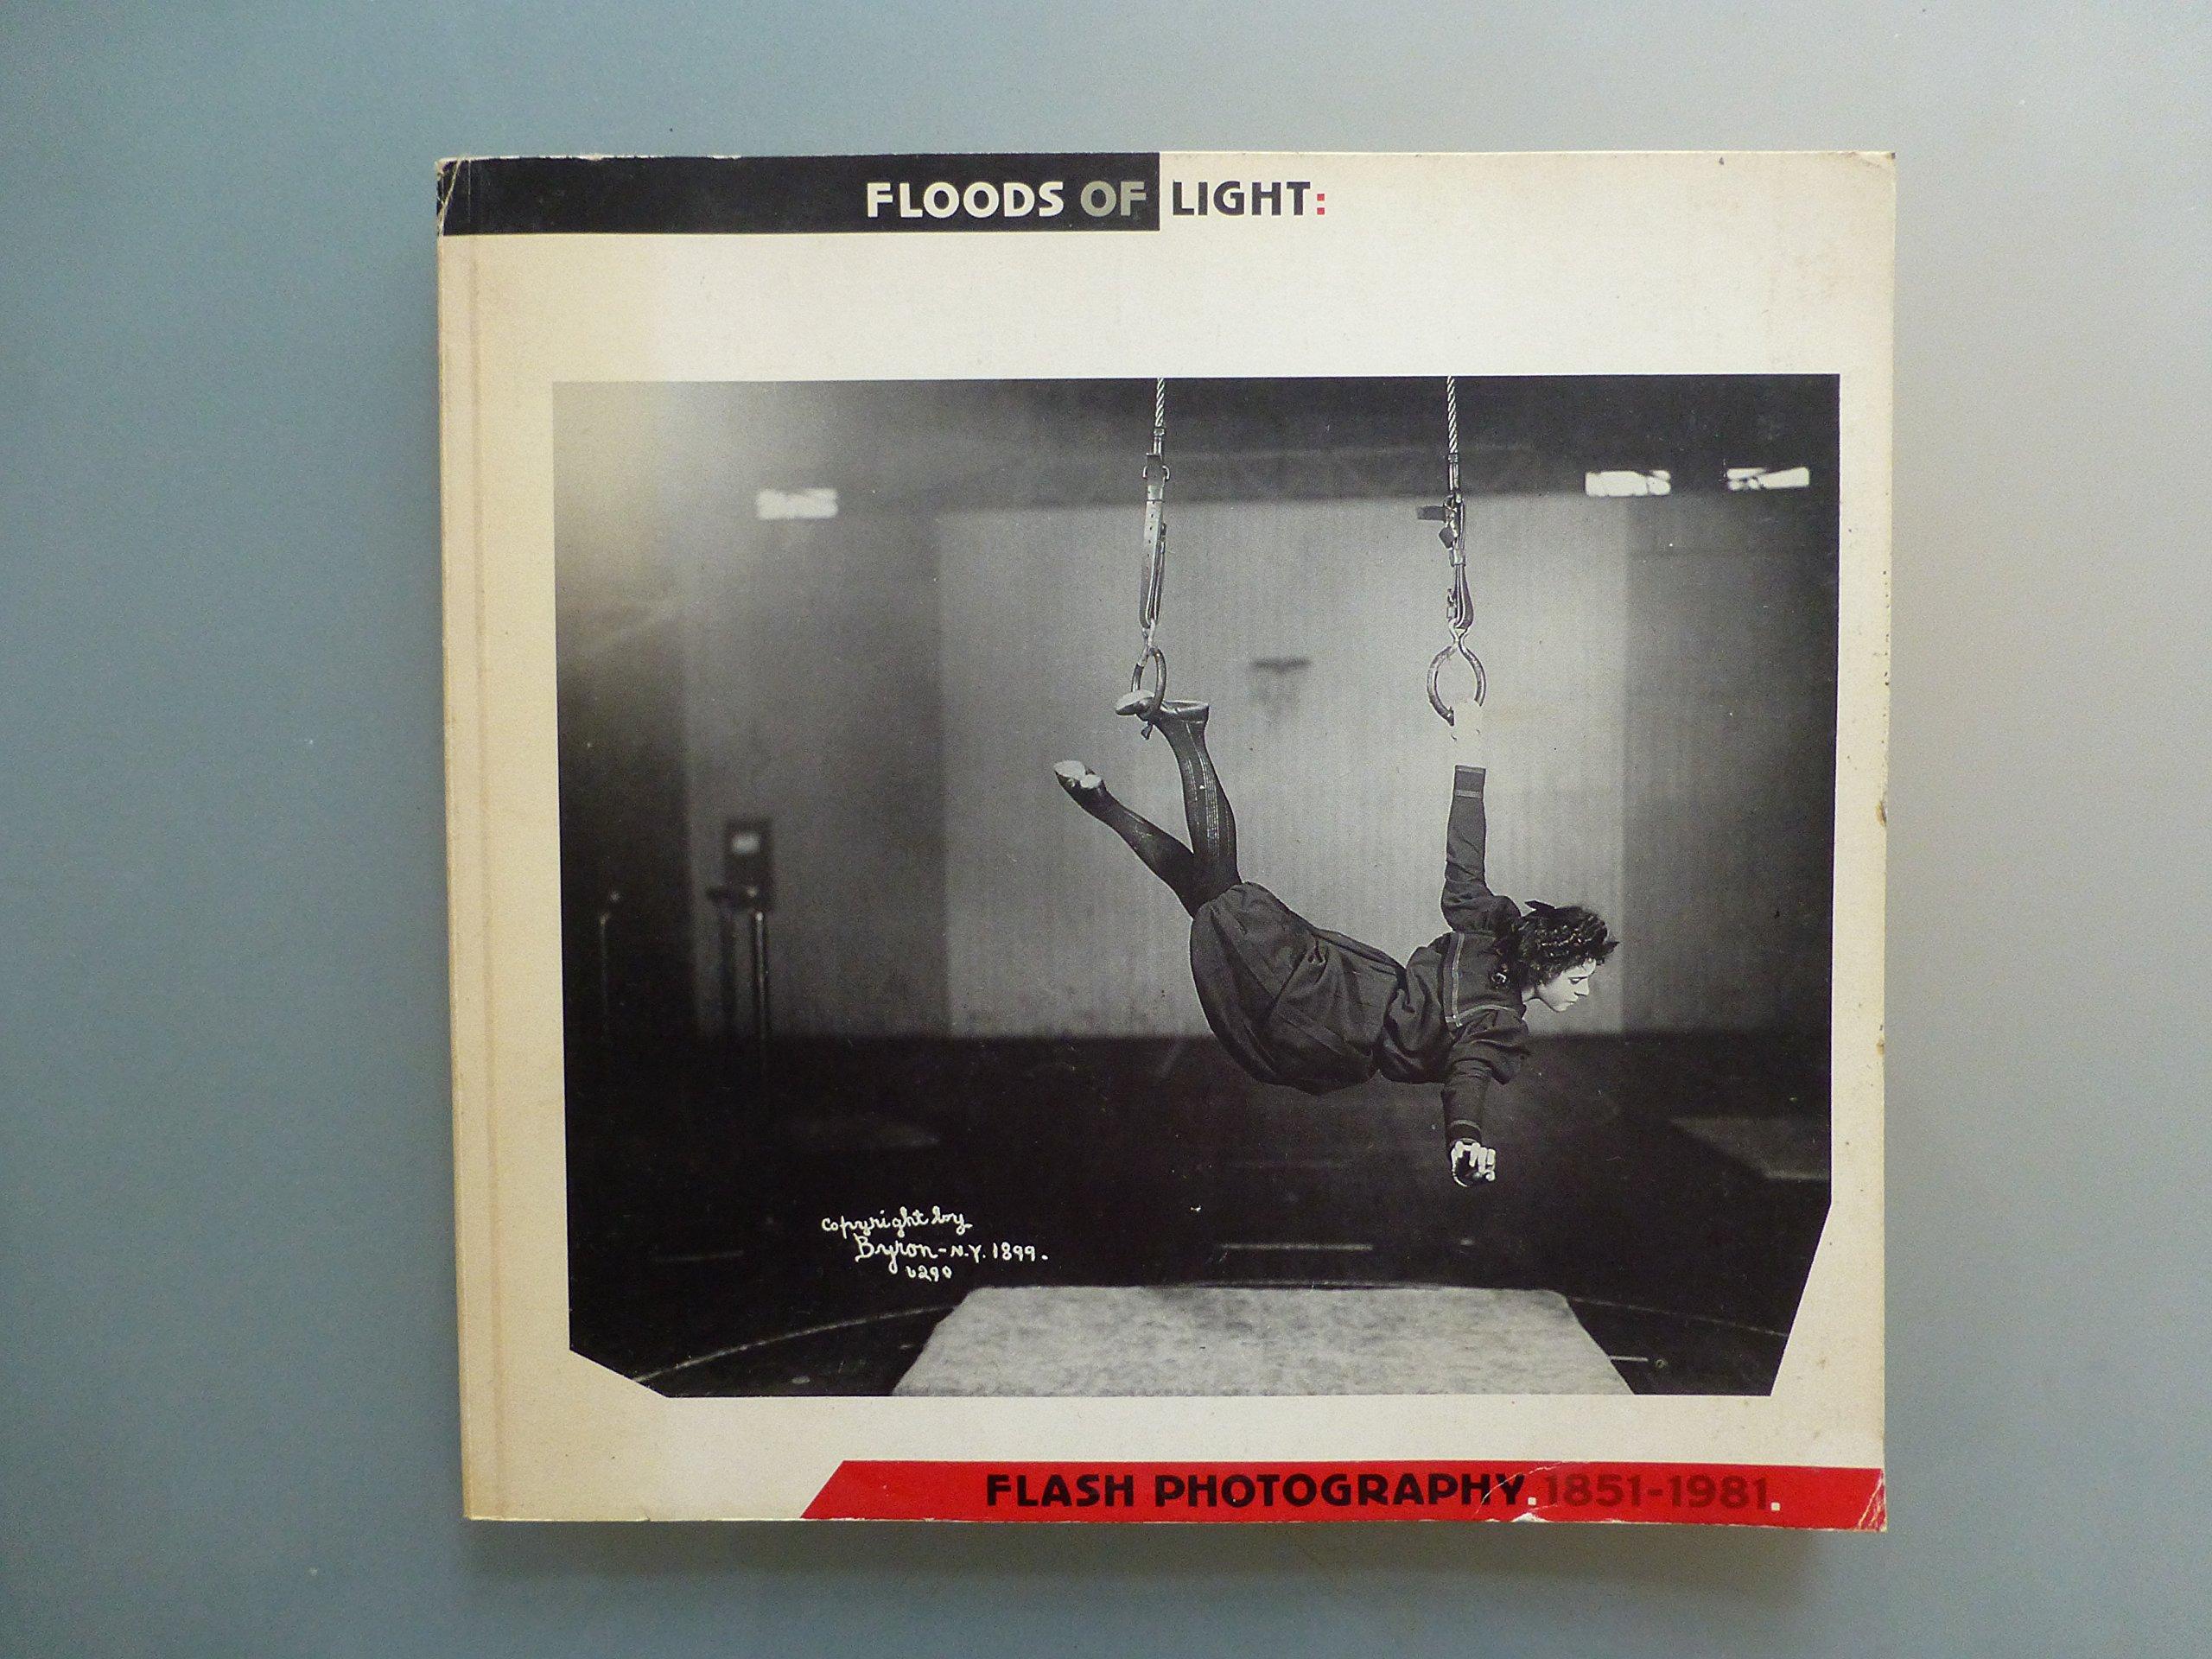 Floods of light: Flash photography, 1851-1981 : 10 December 1982-29 January 1983